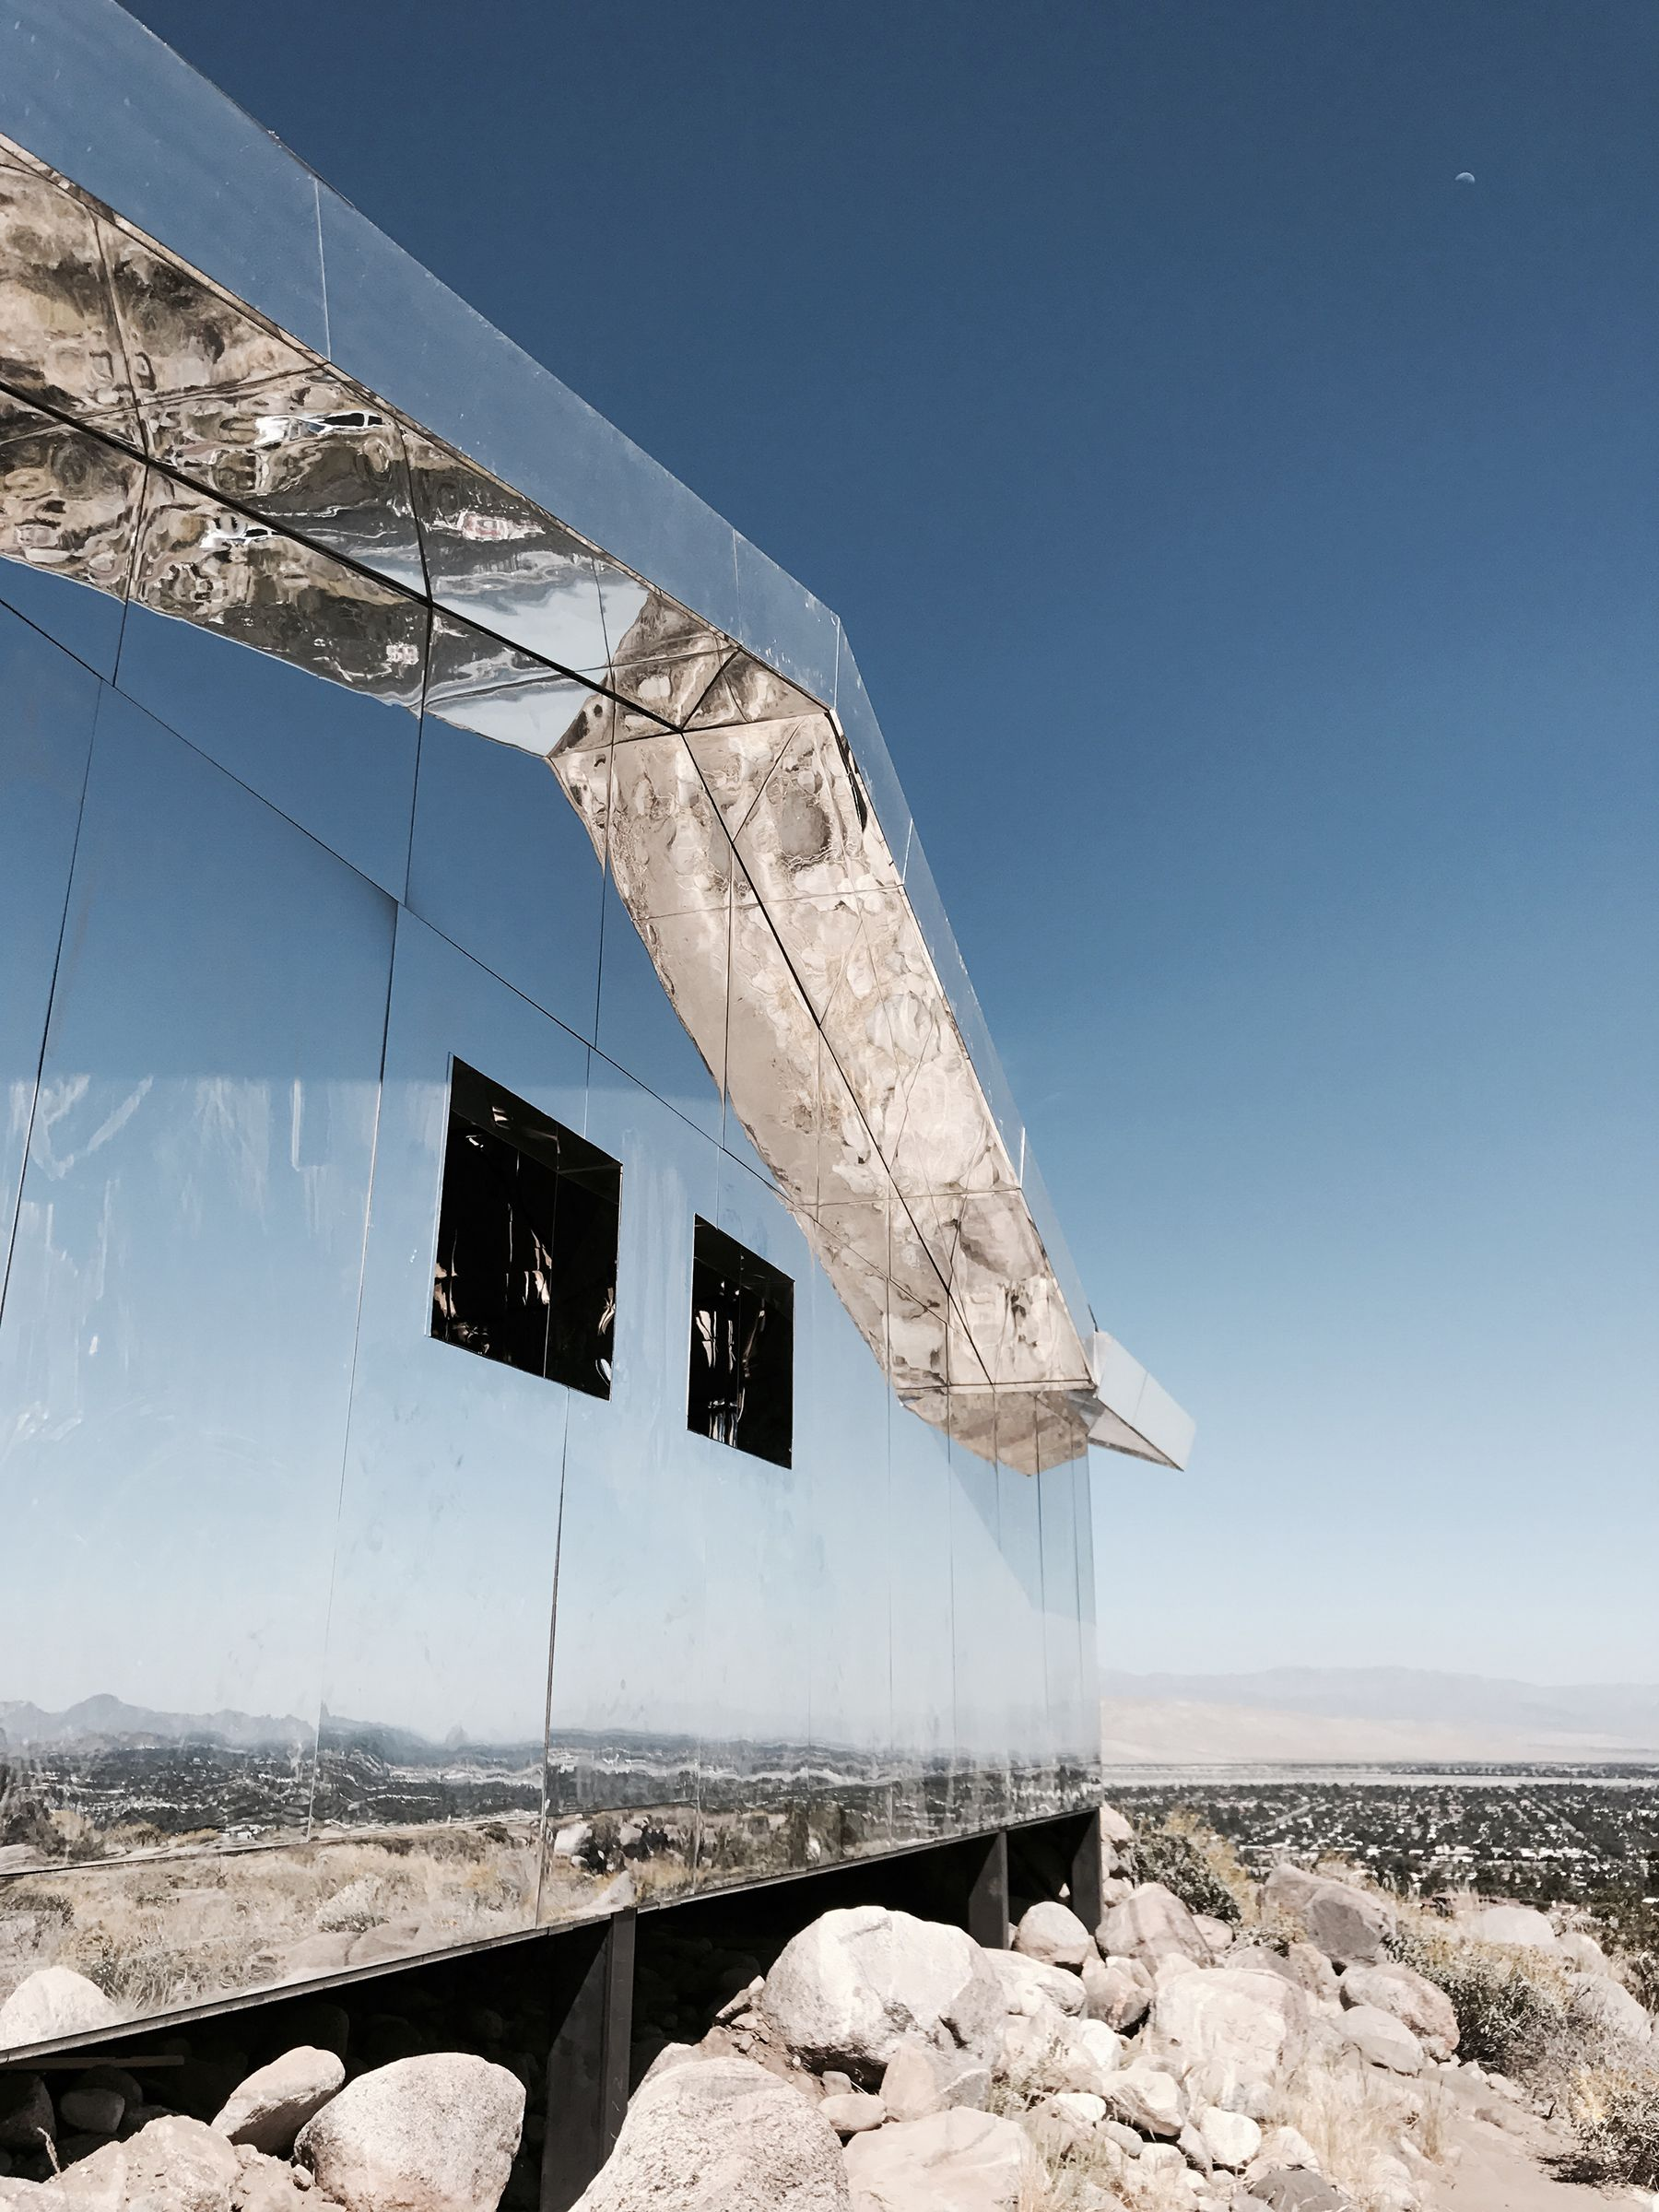 Desert X exhibition / Doug Aitken mirage. Via Mija | SS 19: VENTURA ...